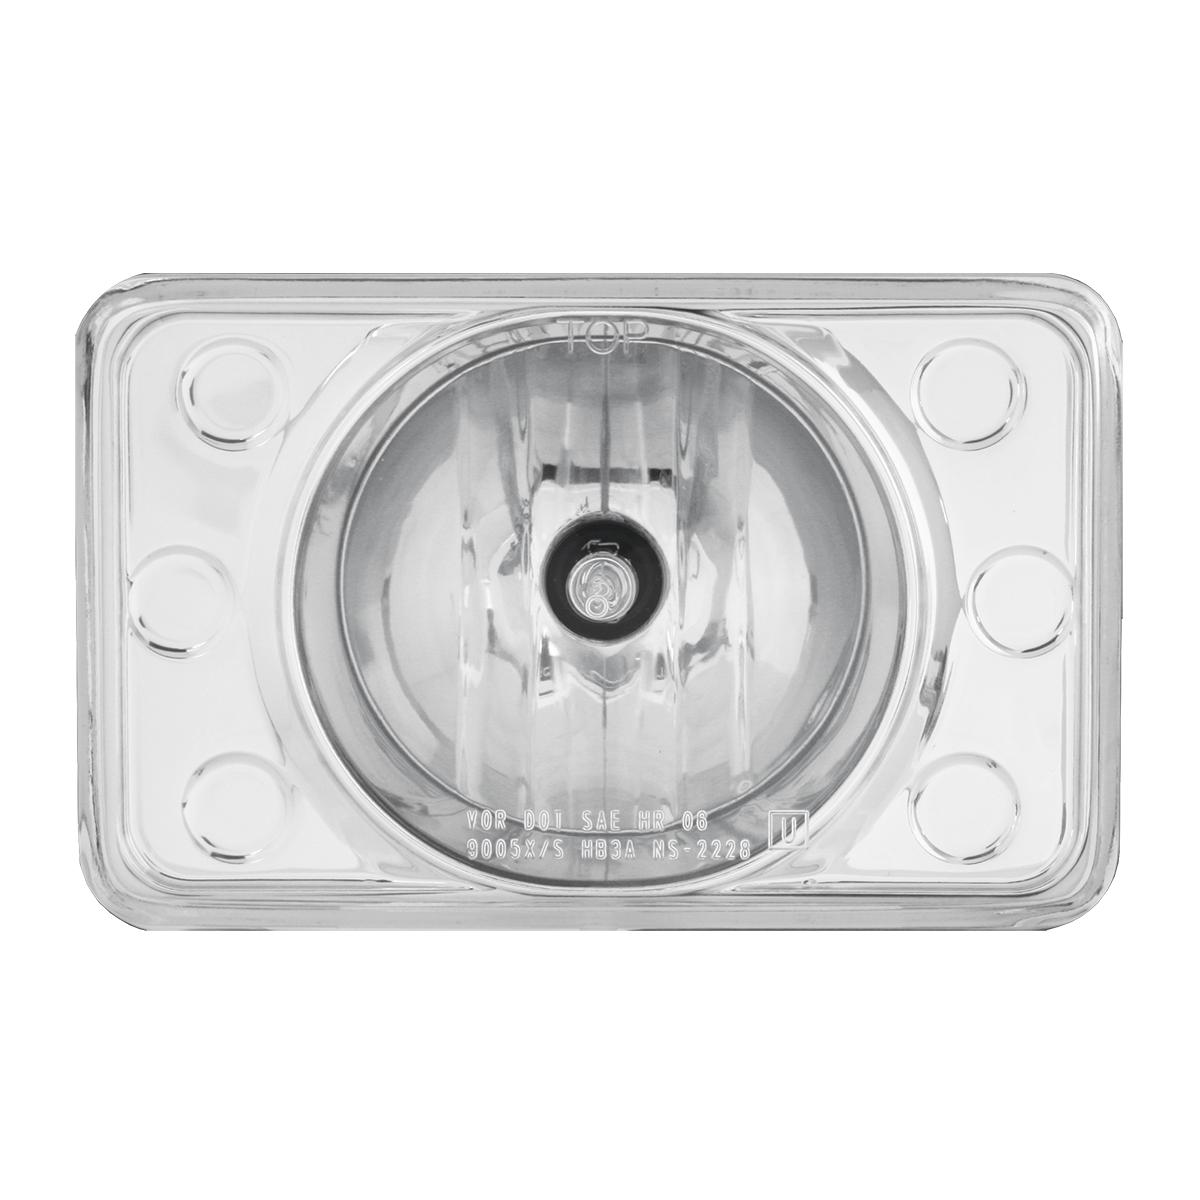 #77404 Standard Lens - High Beam Only